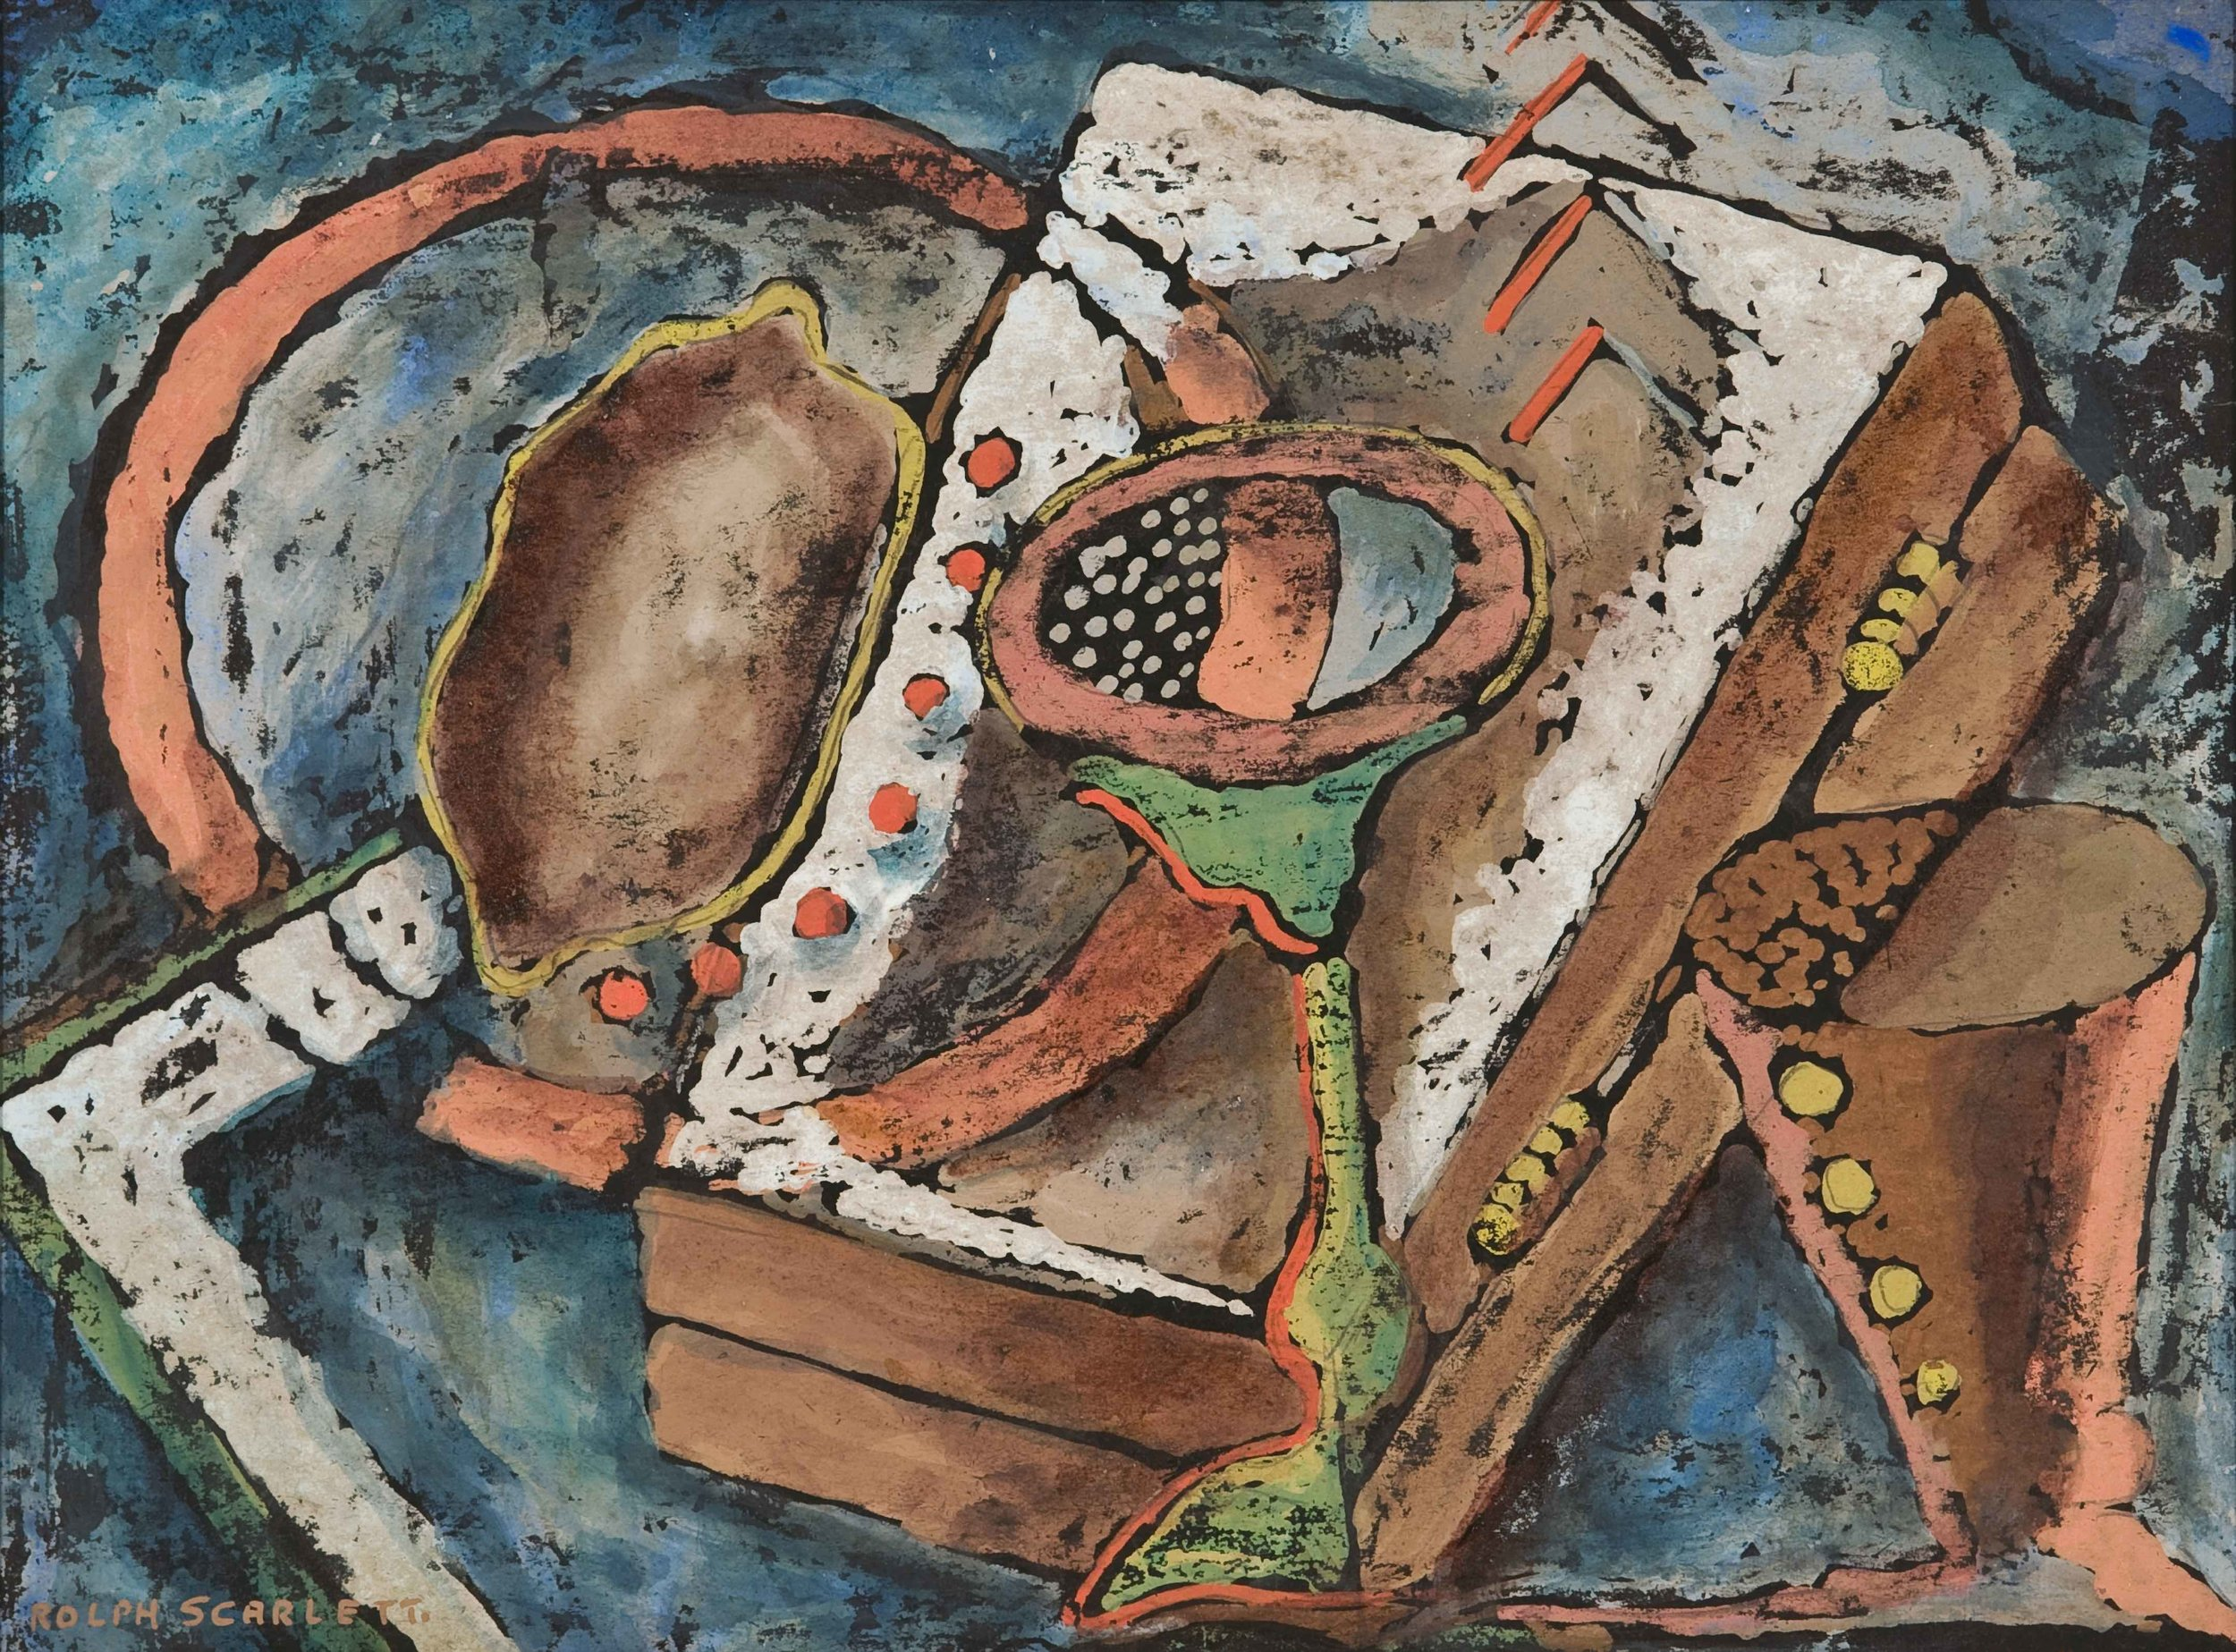 "Rolph Scarlet, Modern Composition #3 (RS159) , c. 1914, oil monotype, 15 5/8 x 19 1/4"" framed"